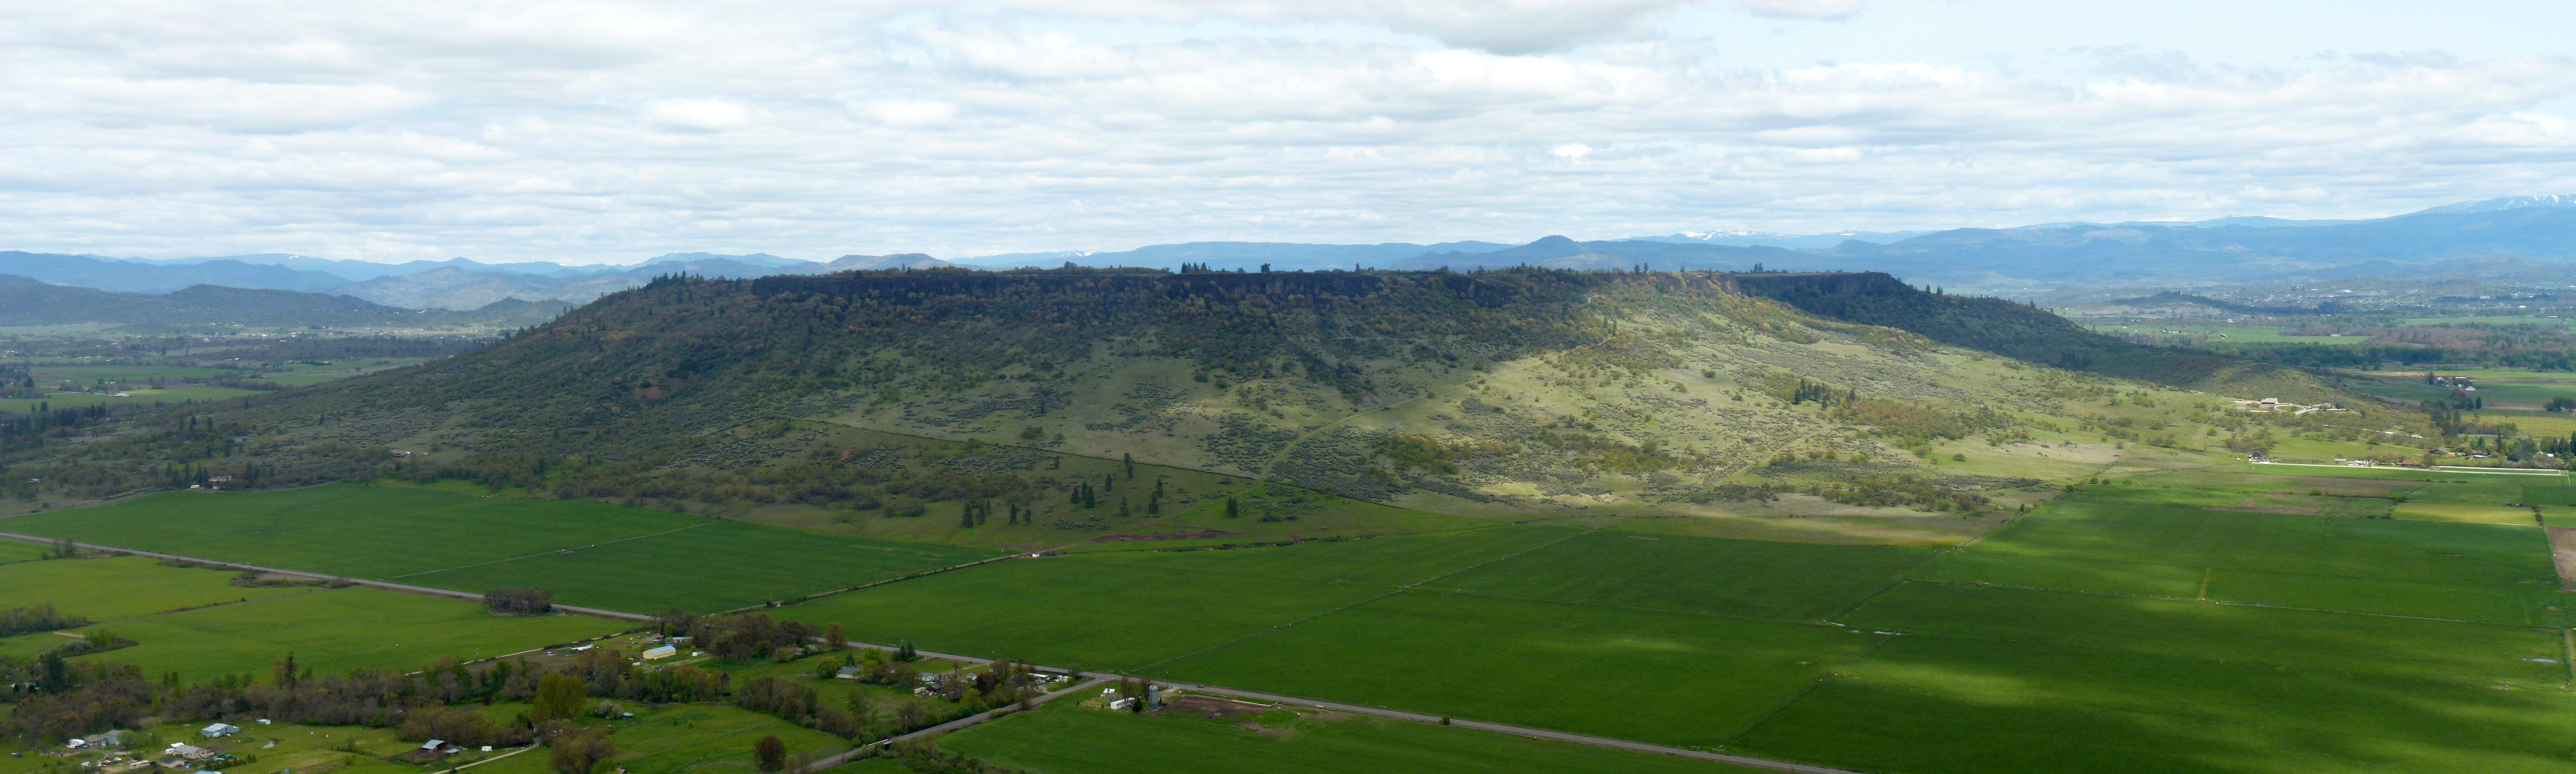 Upper_Table_Rock_Panorama_2